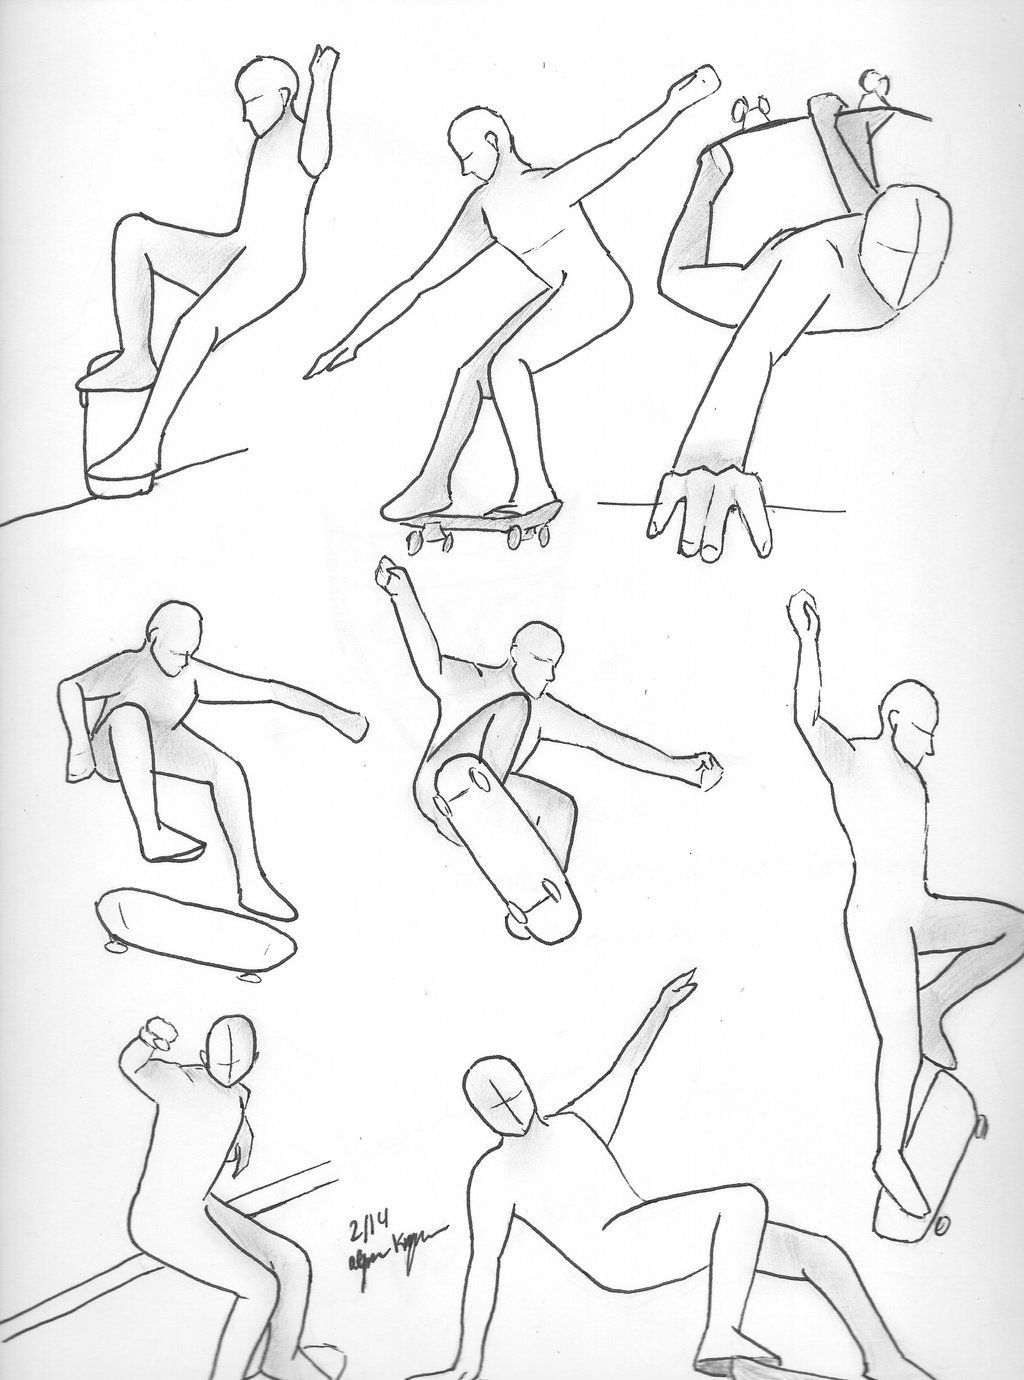 Skateboard Poses Buscar Con Google Body Drawing Tutorial Skate Art Art